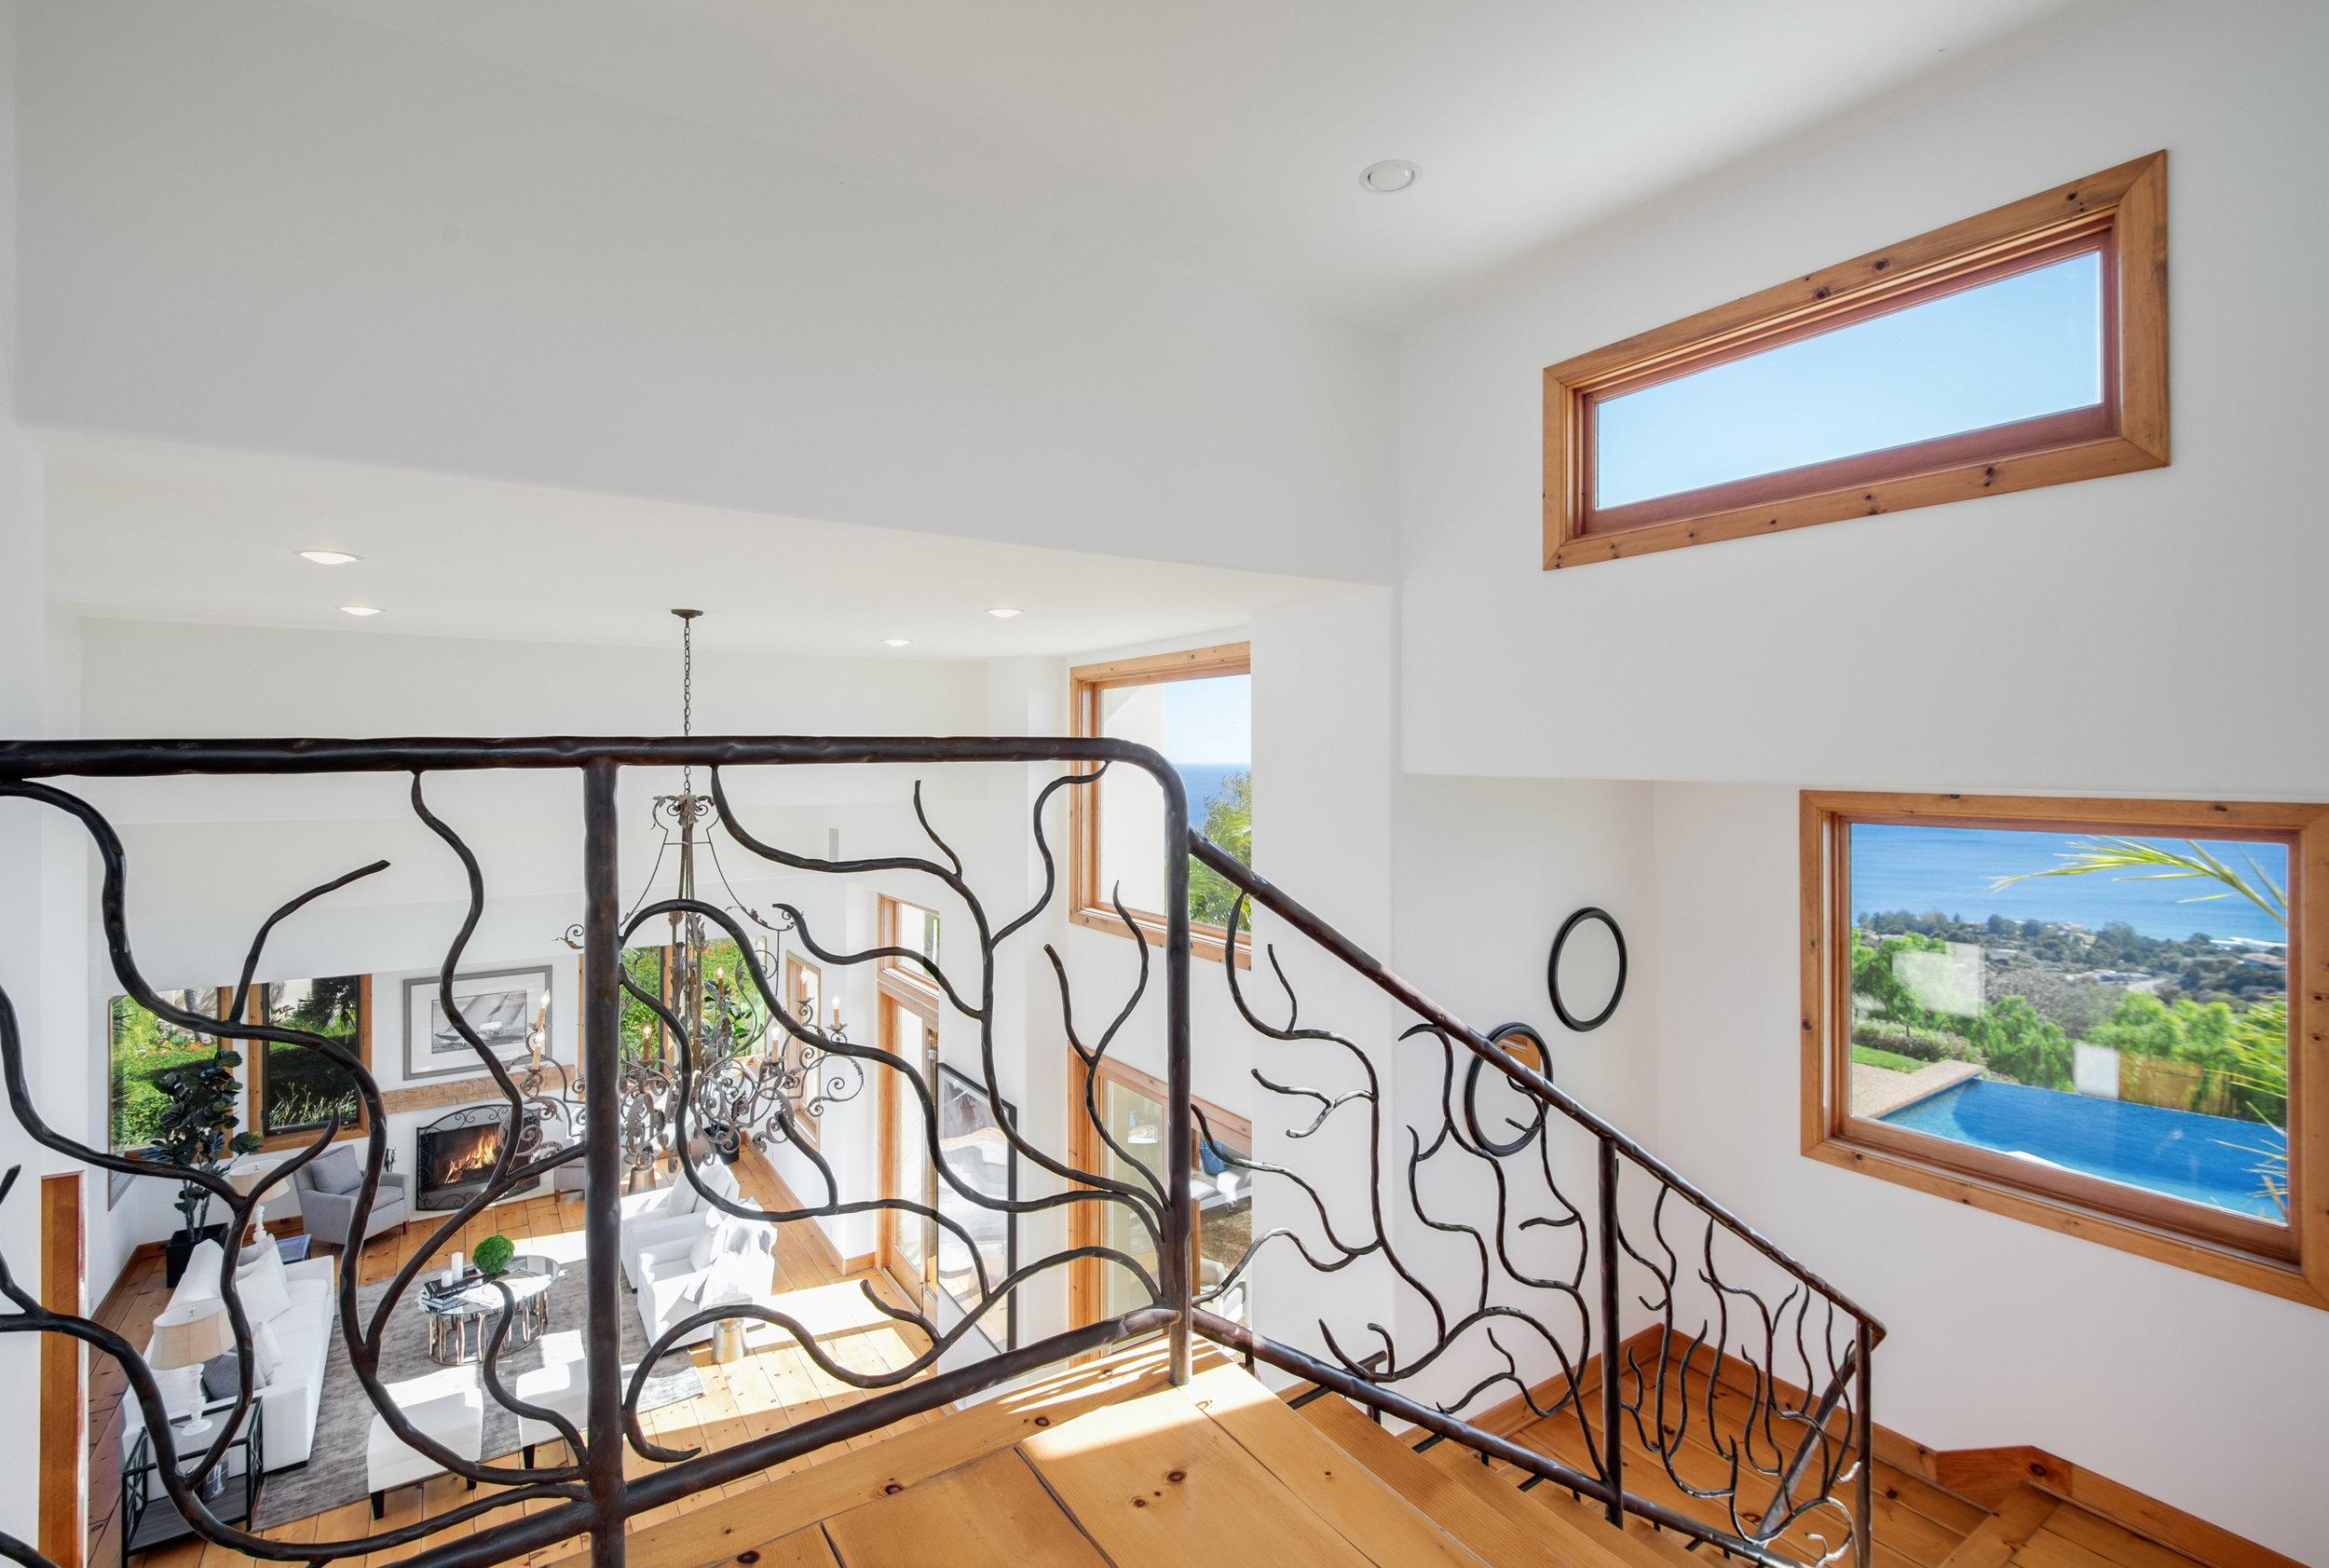 024 Stairs 27475 Latigo Bay View Drive For Sale Lease The Malibu Life Team Luxury Real Estate.jpg